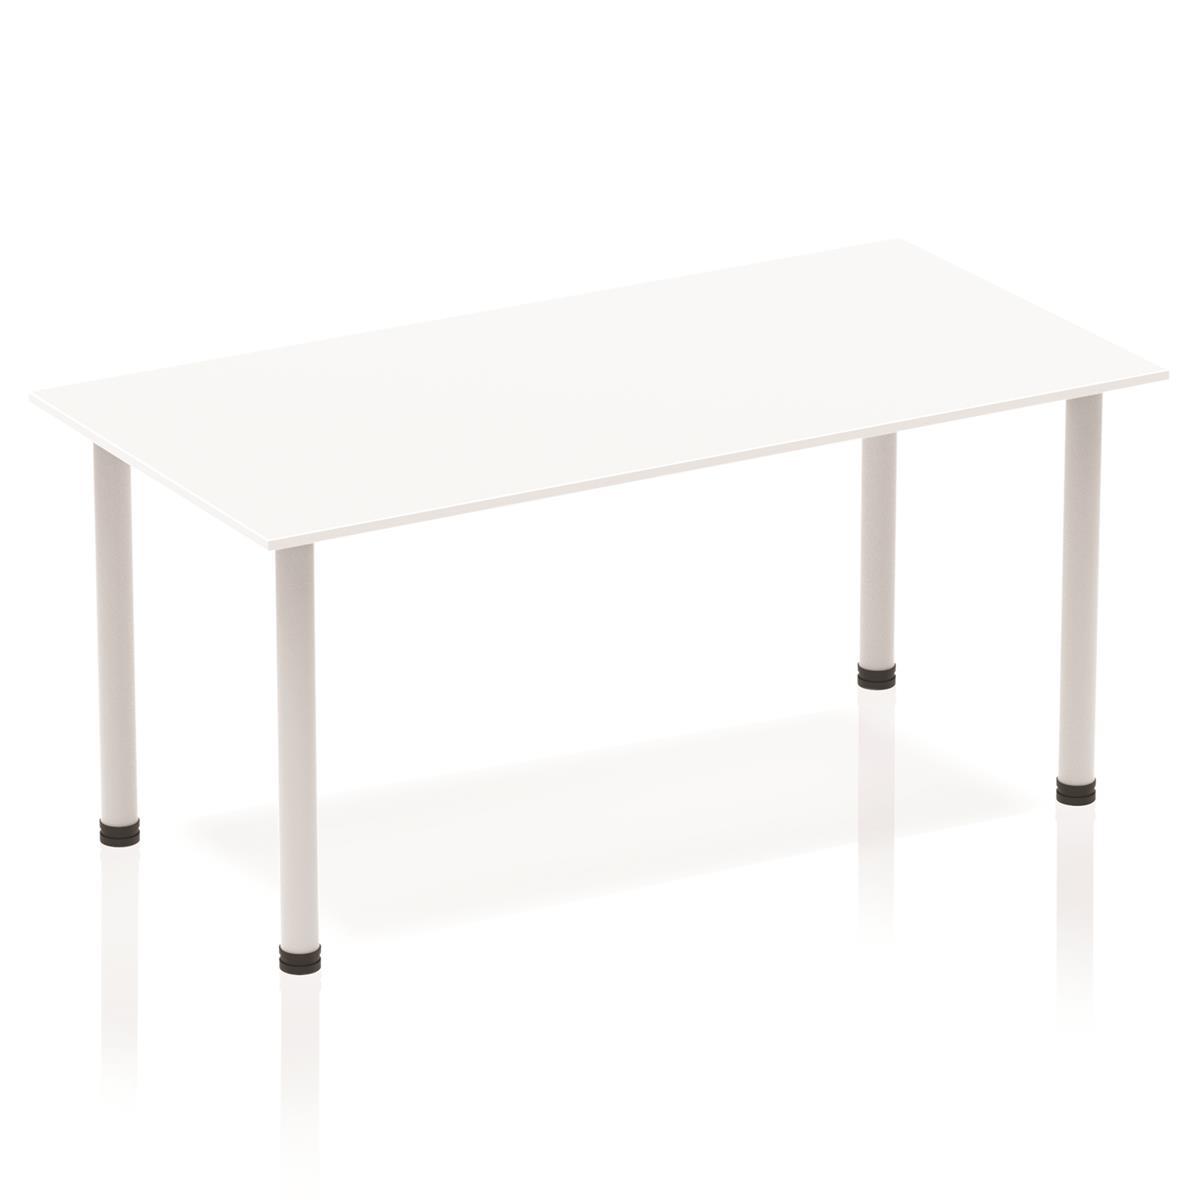 Sonix Rectangular Silver Post Leg Table 1600x800mm White Ref BF00174